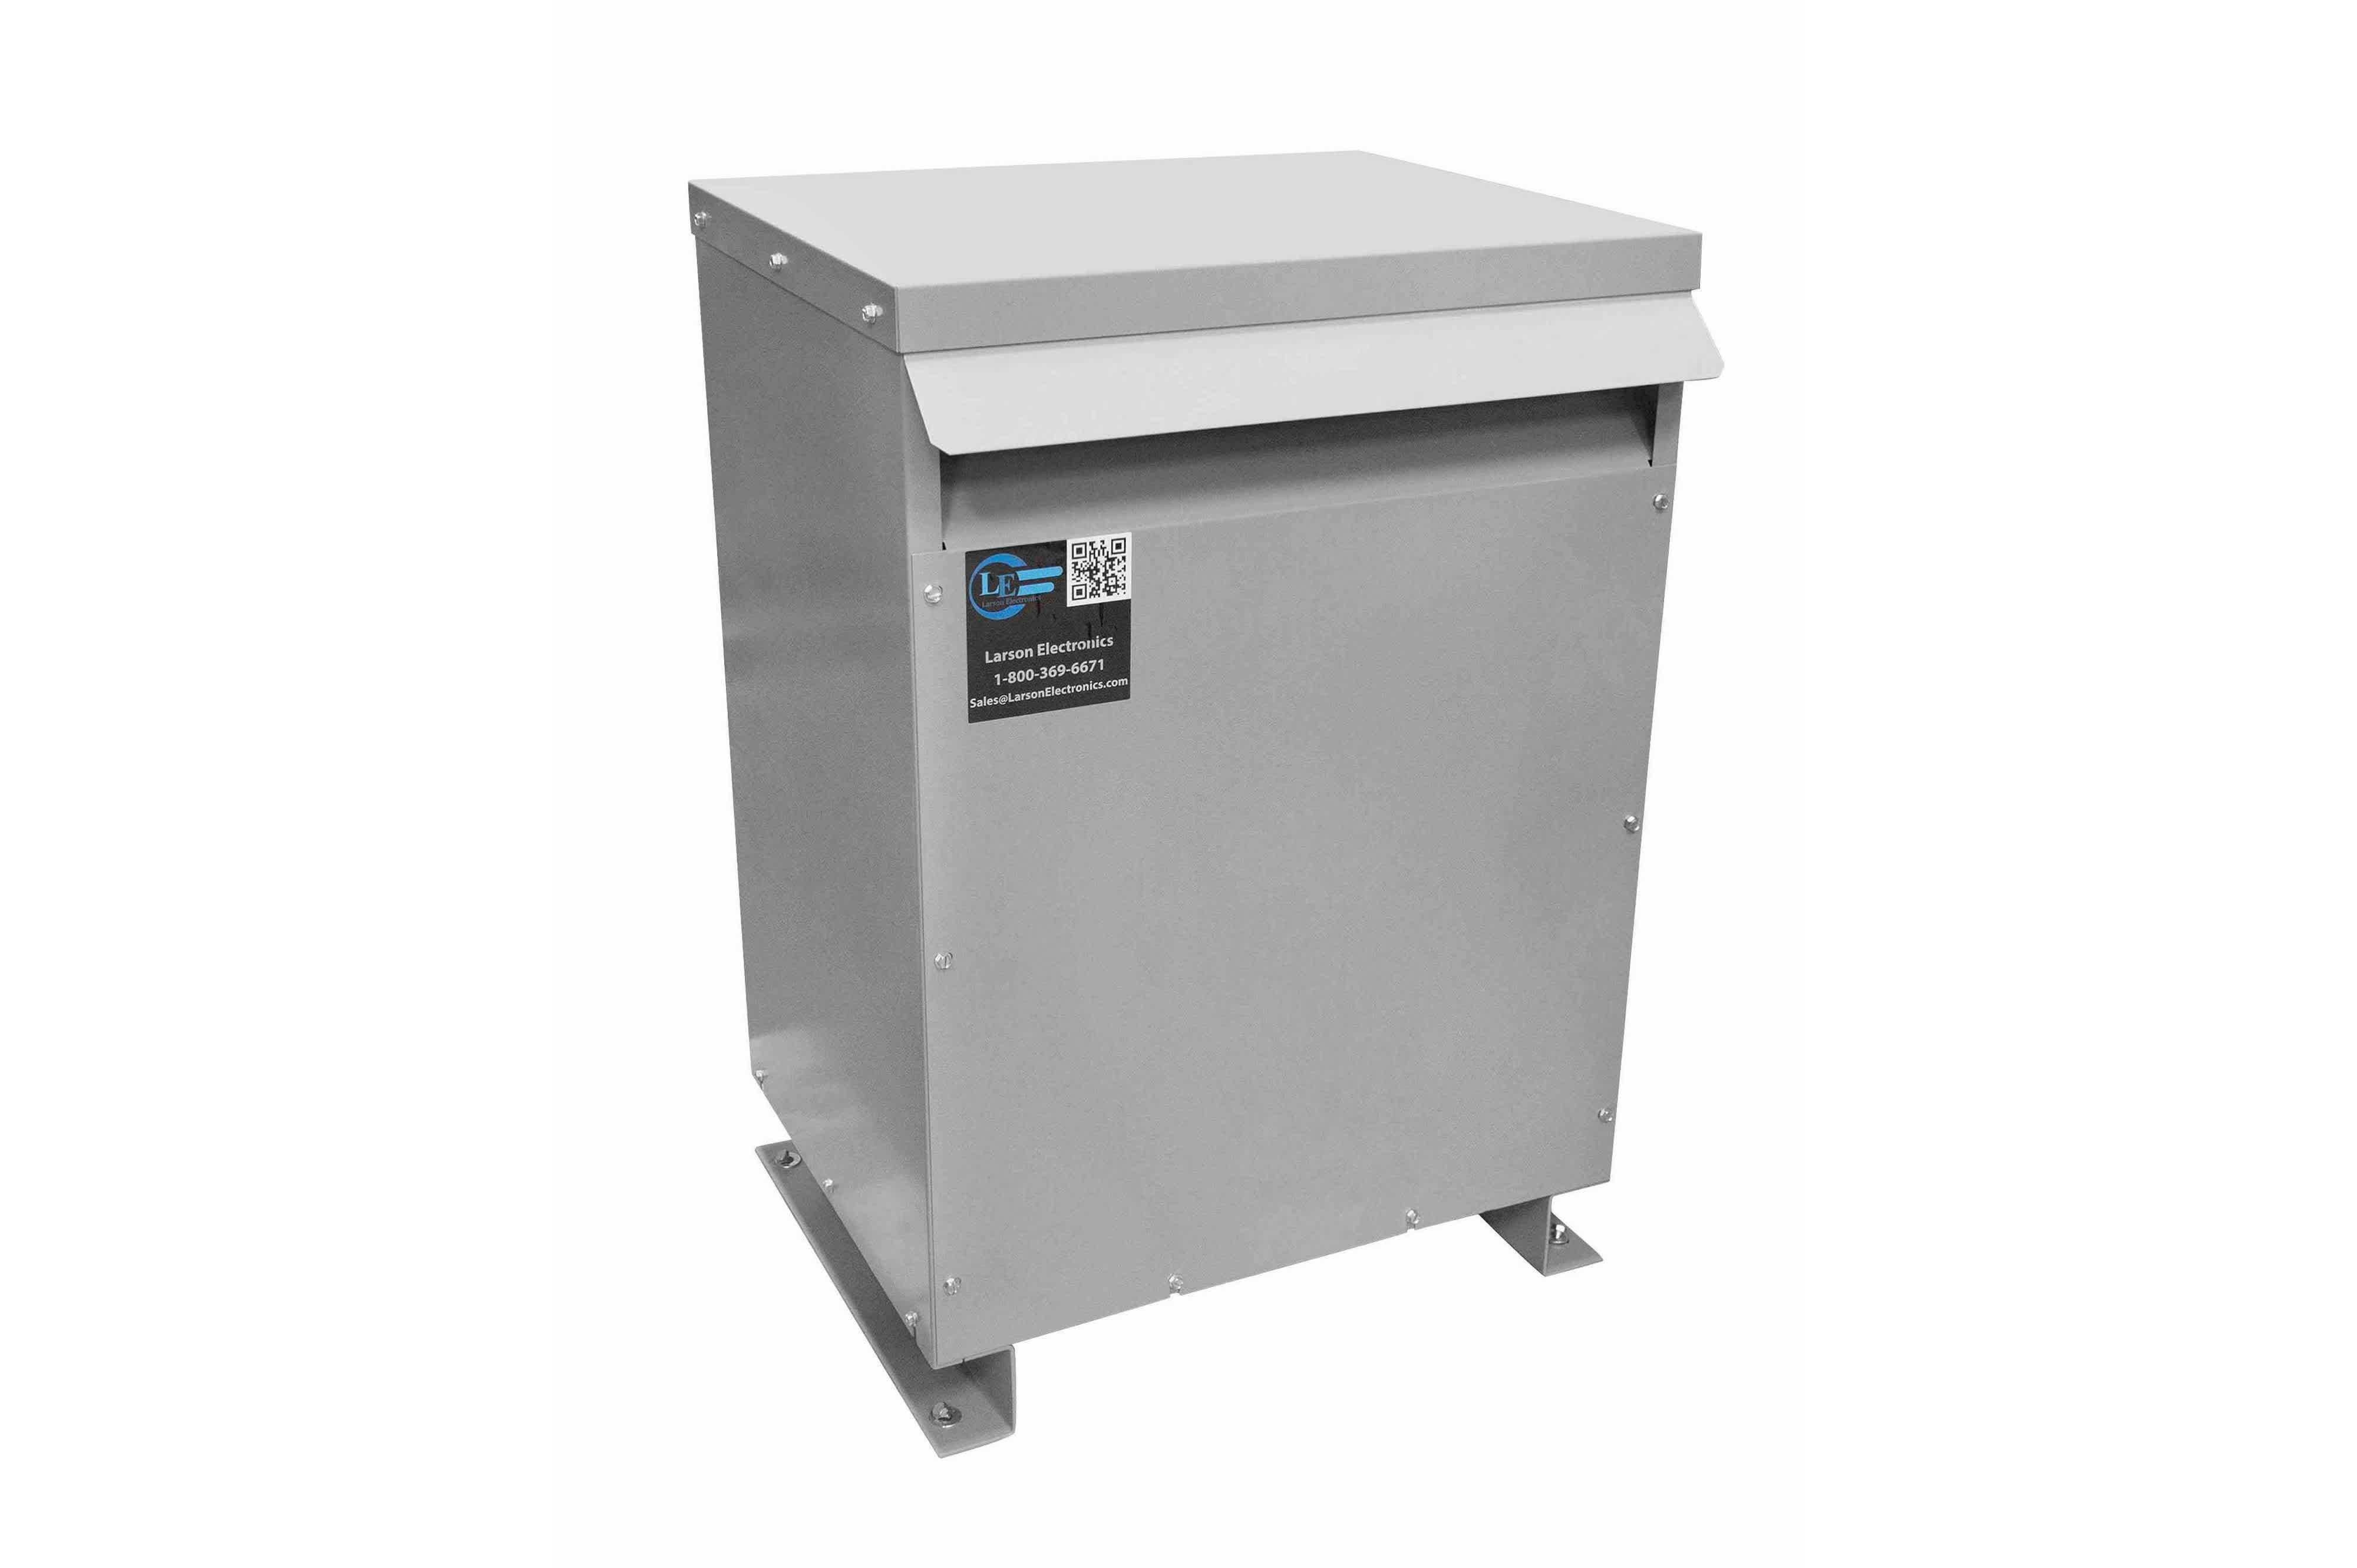 38 kVA 3PH Isolation Transformer, 460V Wye Primary, 240V/120 Delta Secondary, N3R, Ventilated, 60 Hz